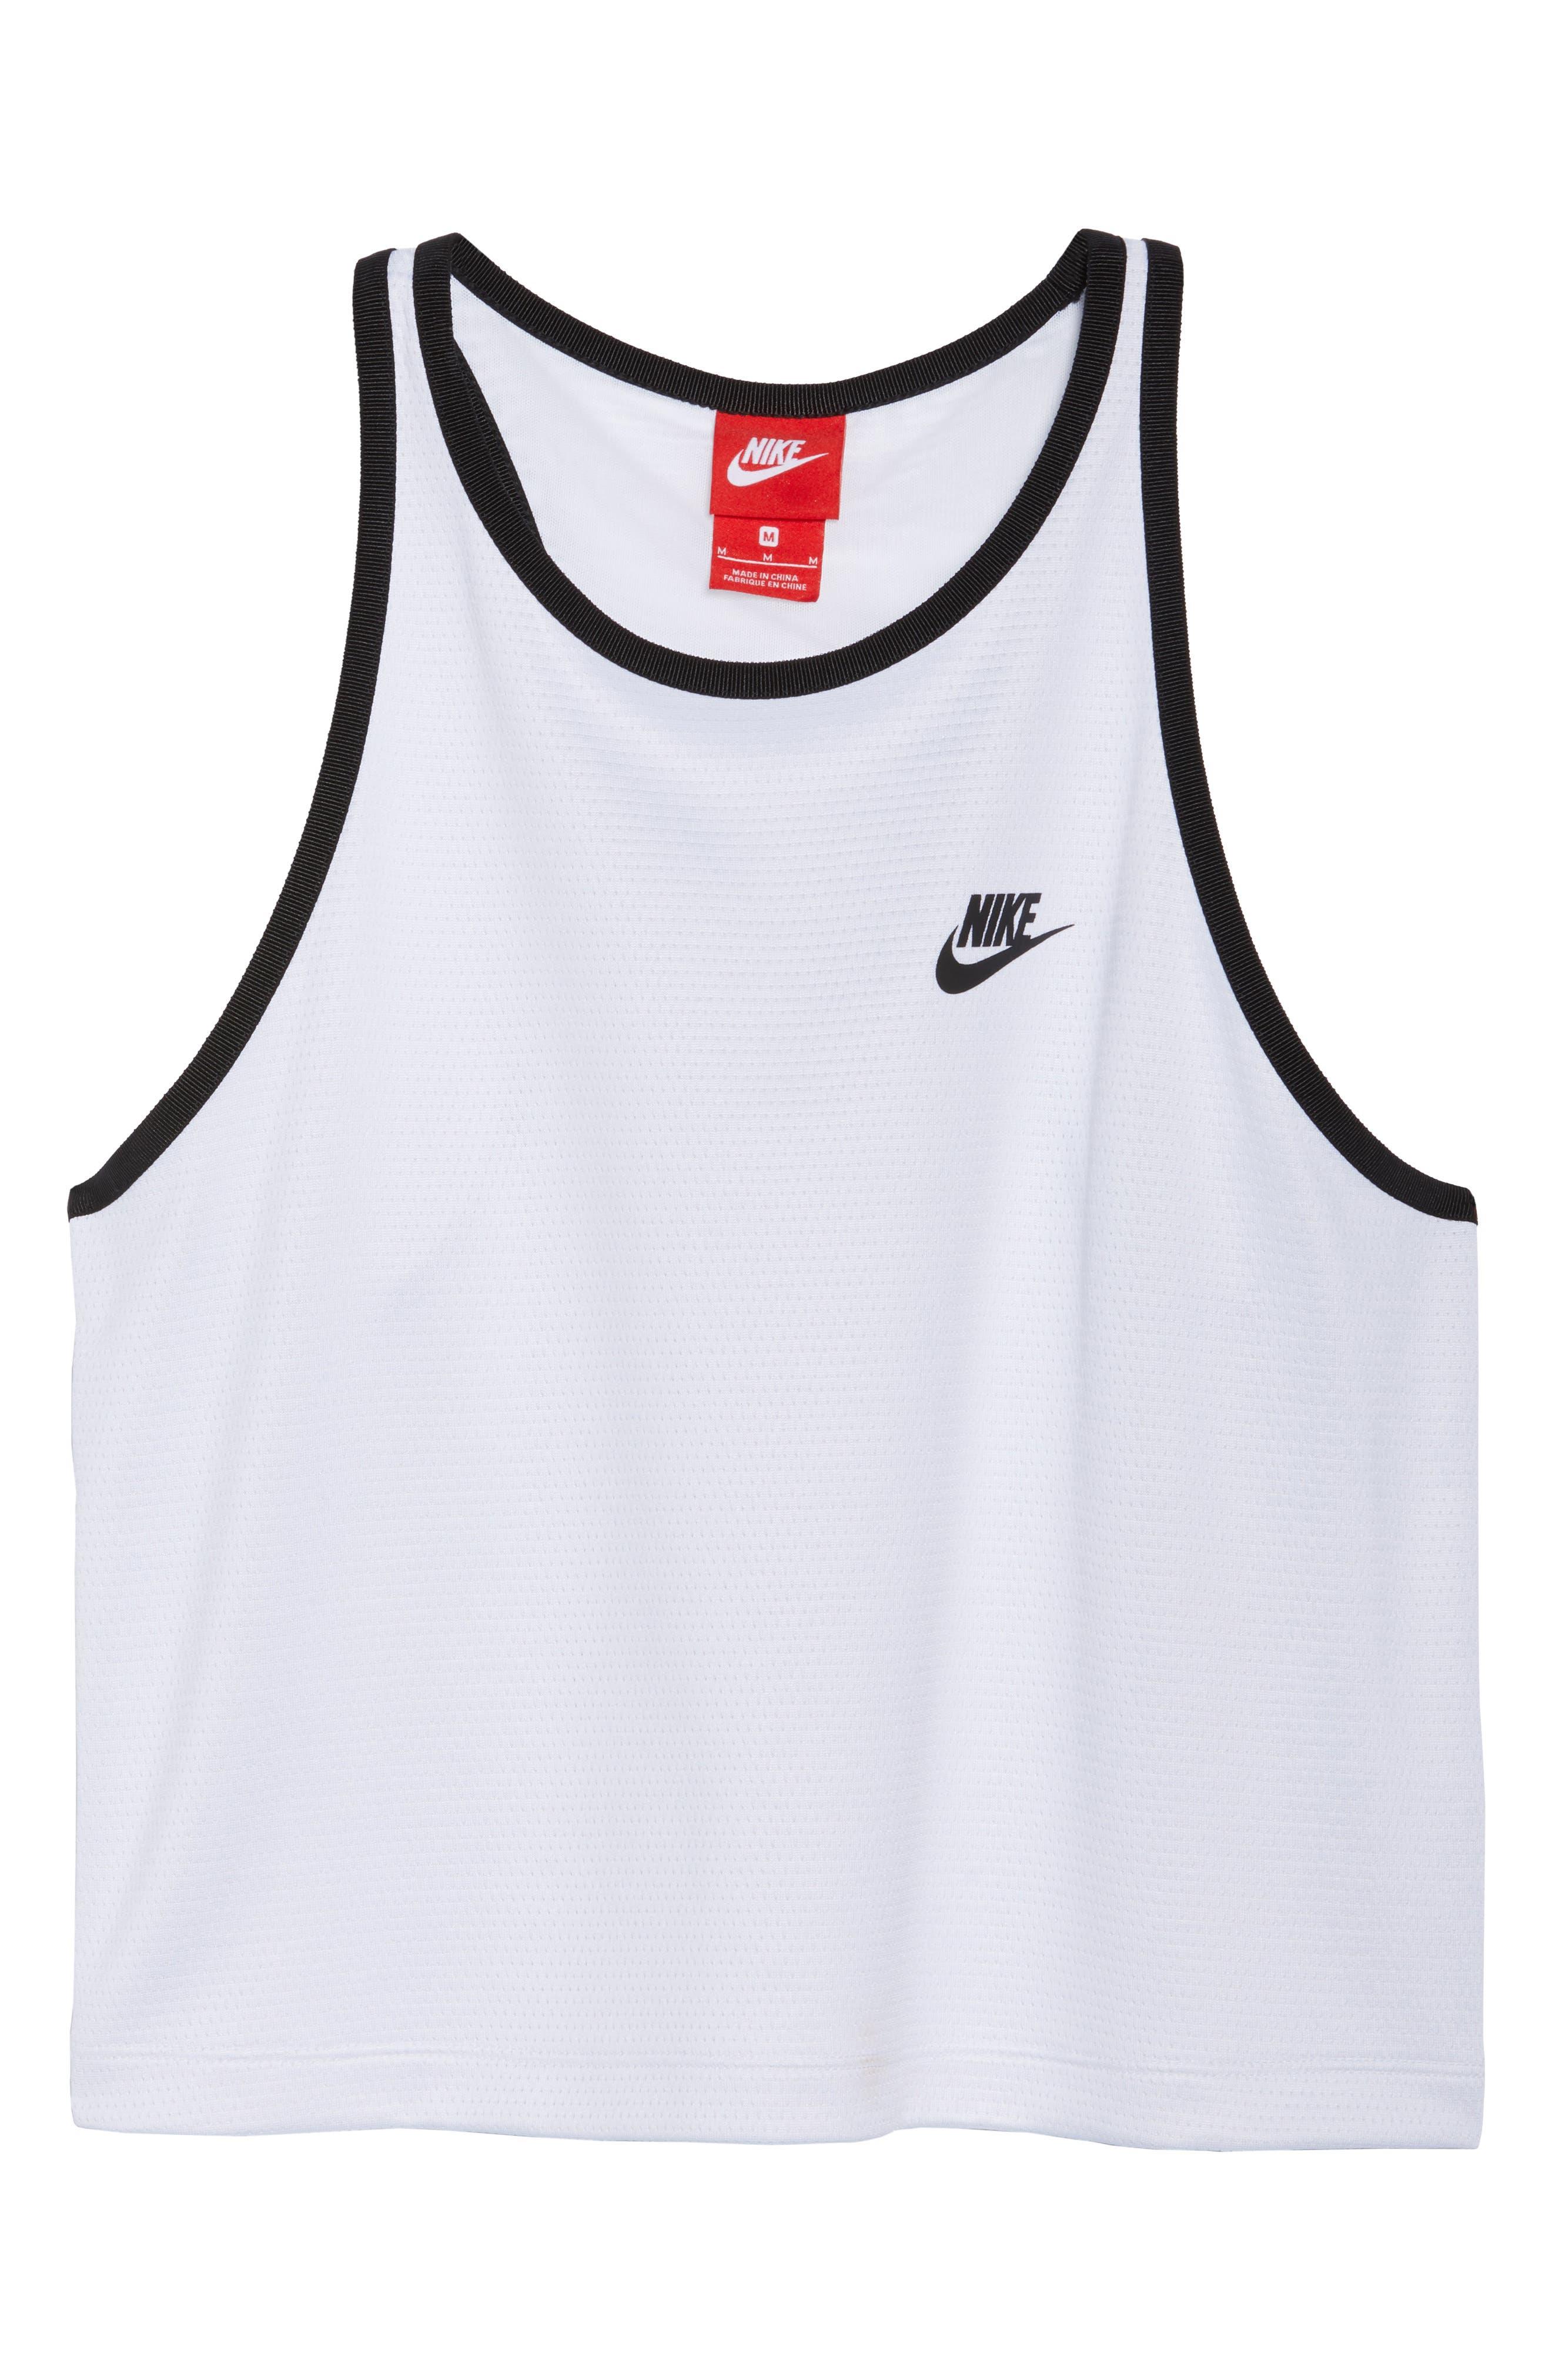 Sportswear Teched Out Tank,                             Alternate thumbnail 7, color,                             White/ Black